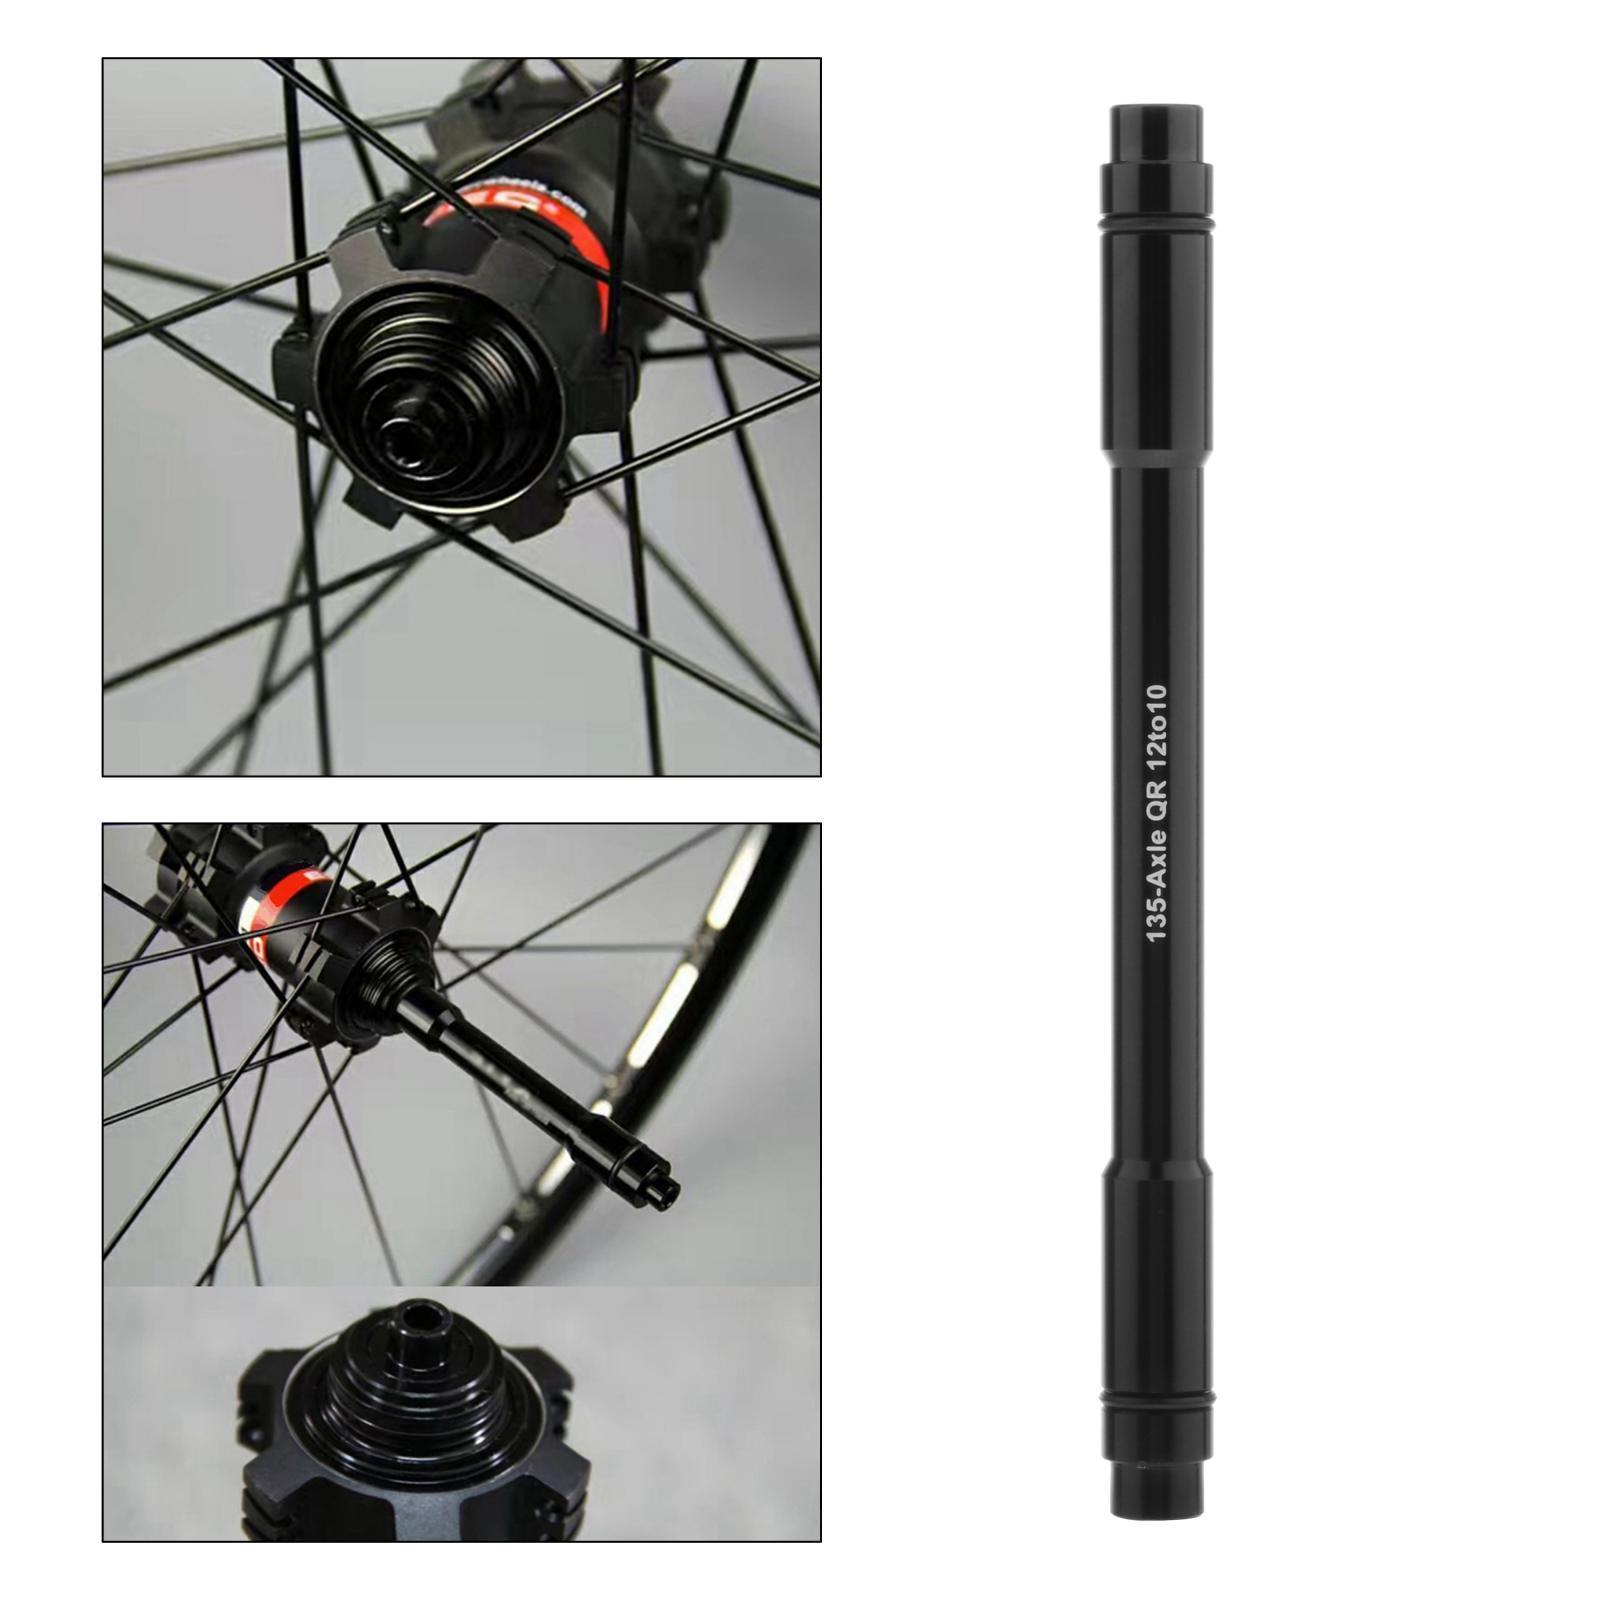 Lixada 12mm to 9mm QR Adapter MTB Bike Thru Axle Hub Quick Release 135mm Parts